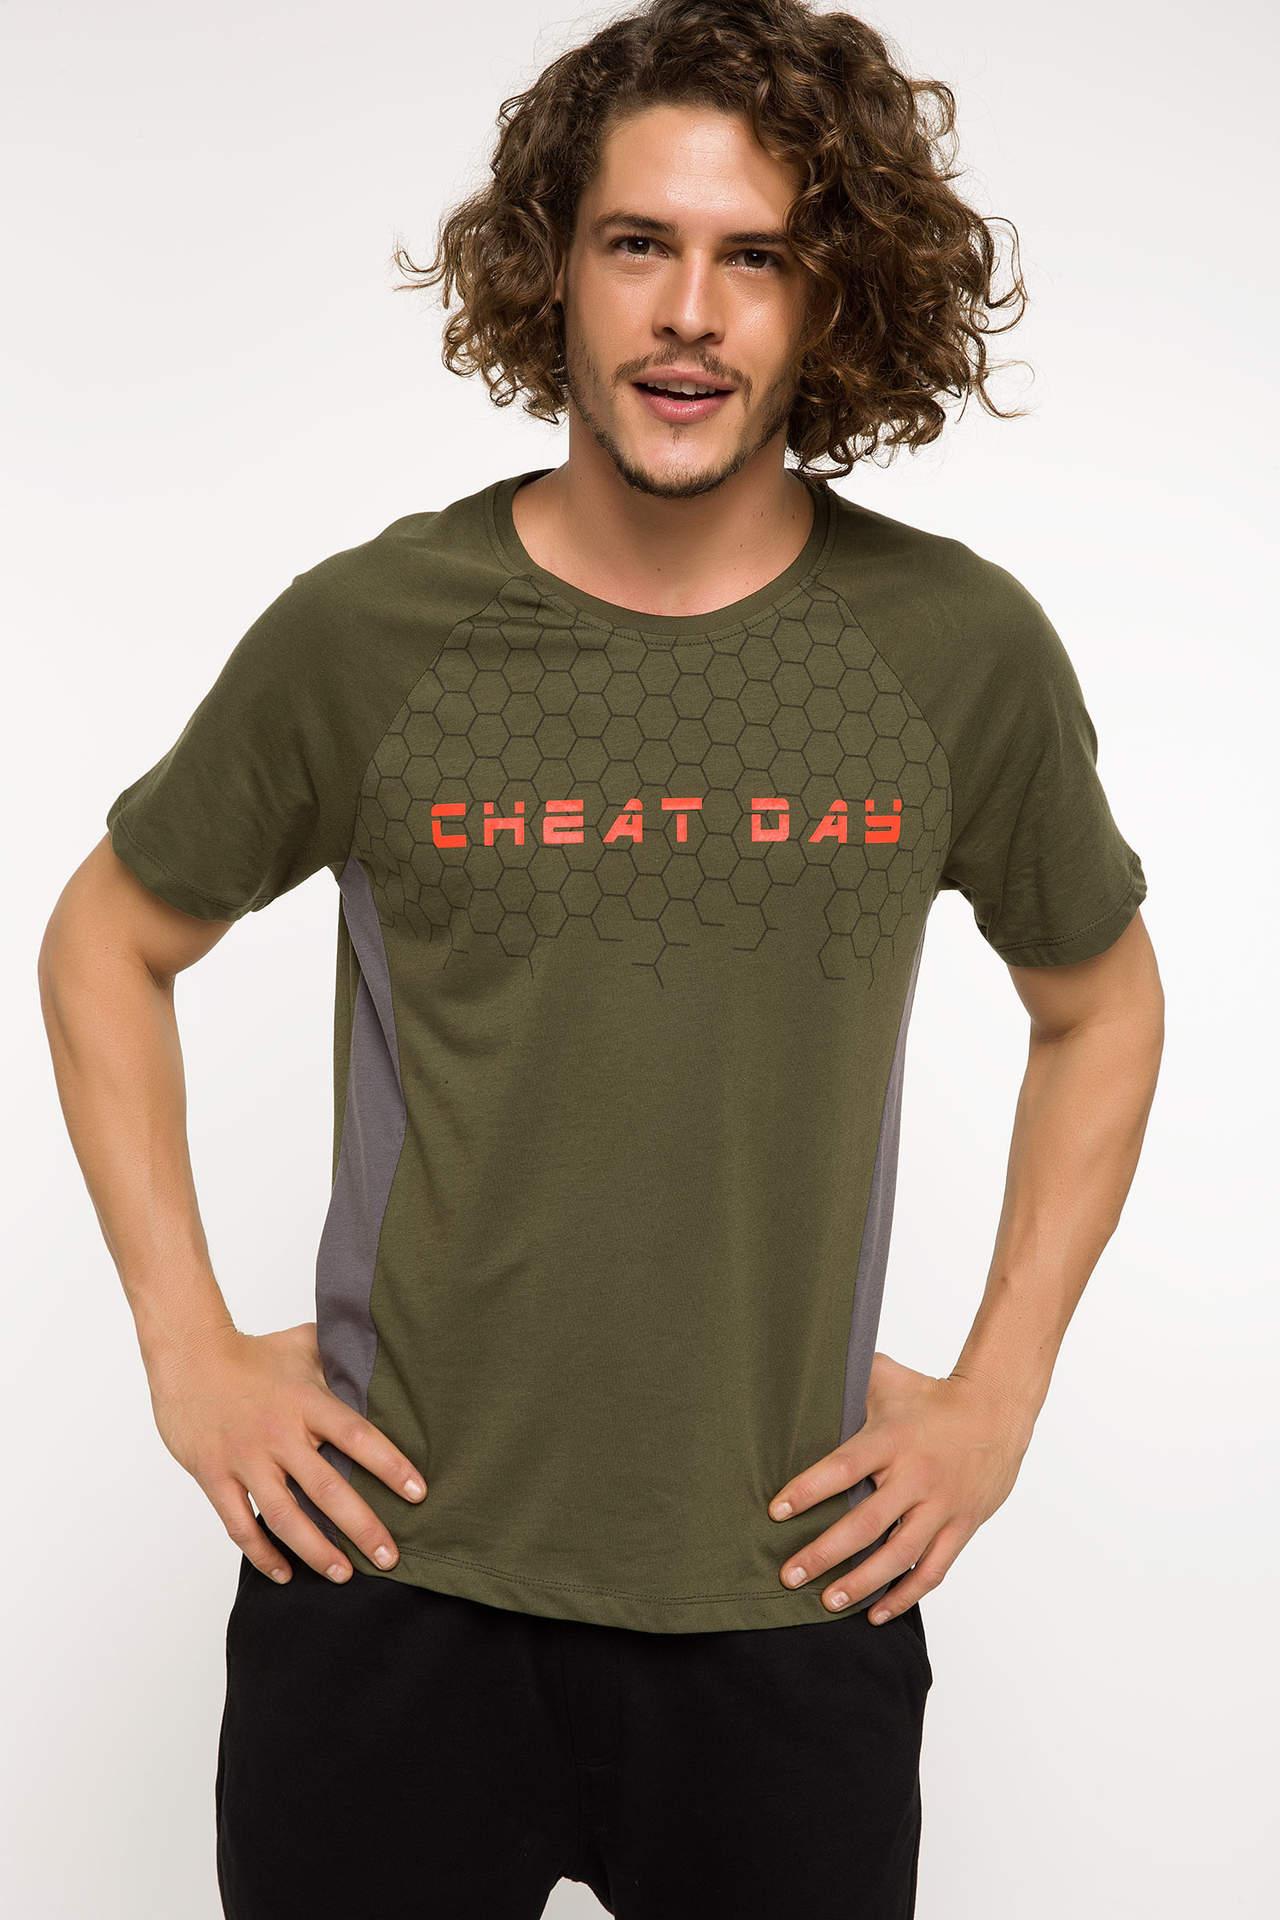 DeFacto Erkek Baskılı Bisiklet Yaka Slim Fit Sporcu T-shirt Haki male